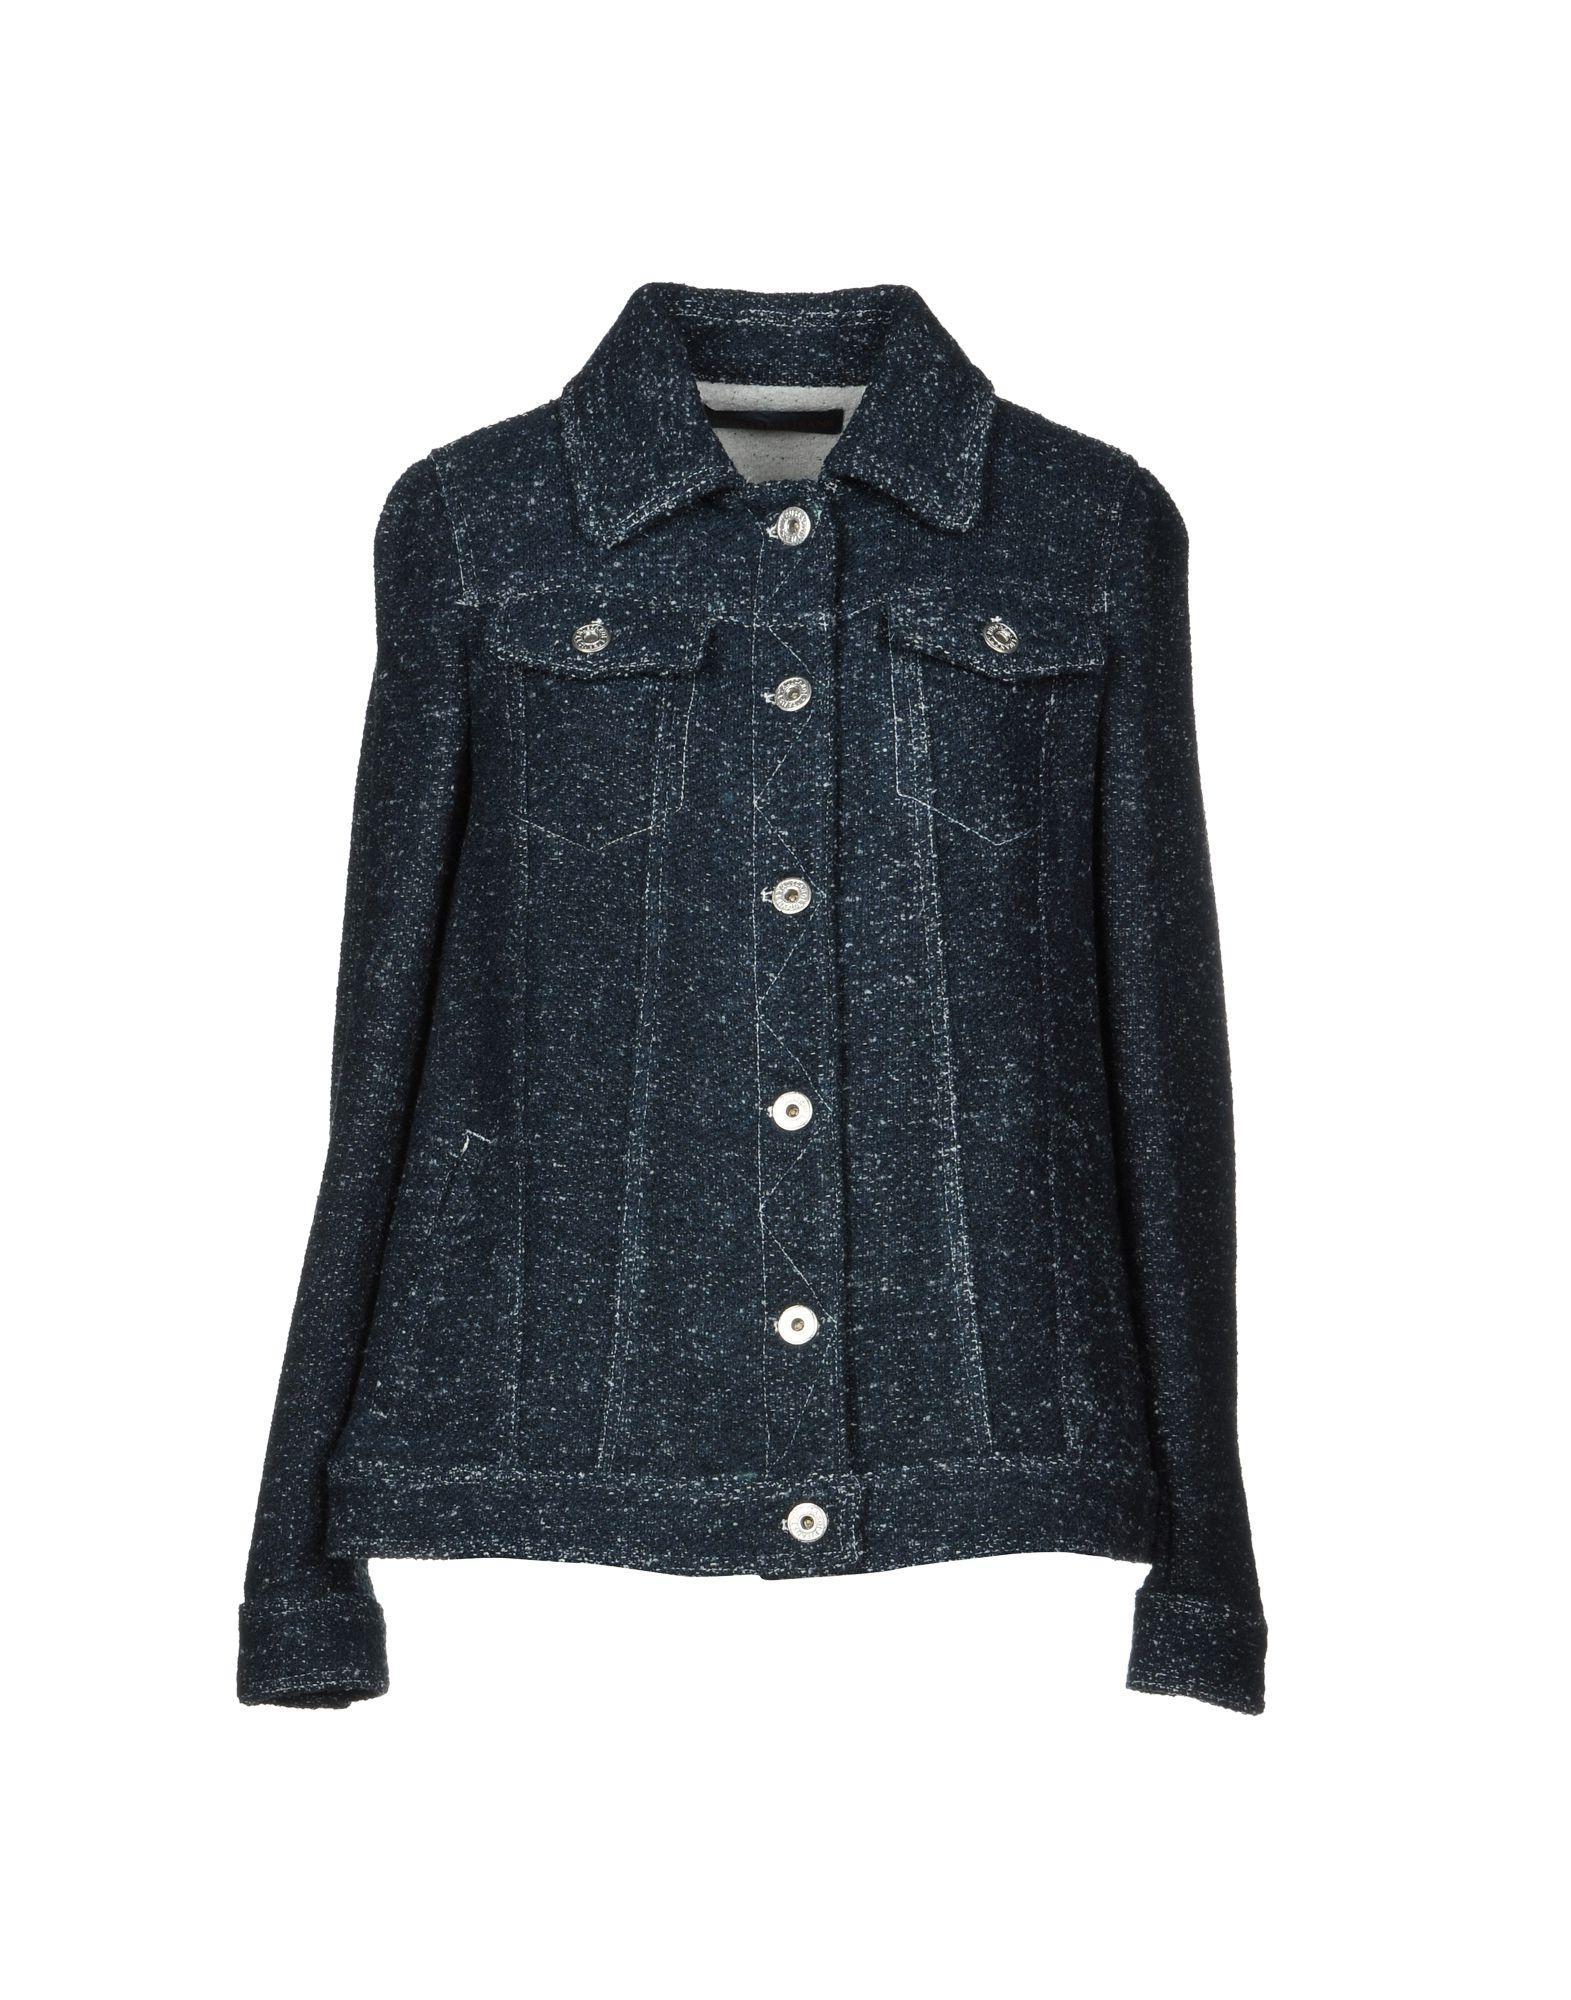 Trussardi Jeans Jackets In Dark Blue